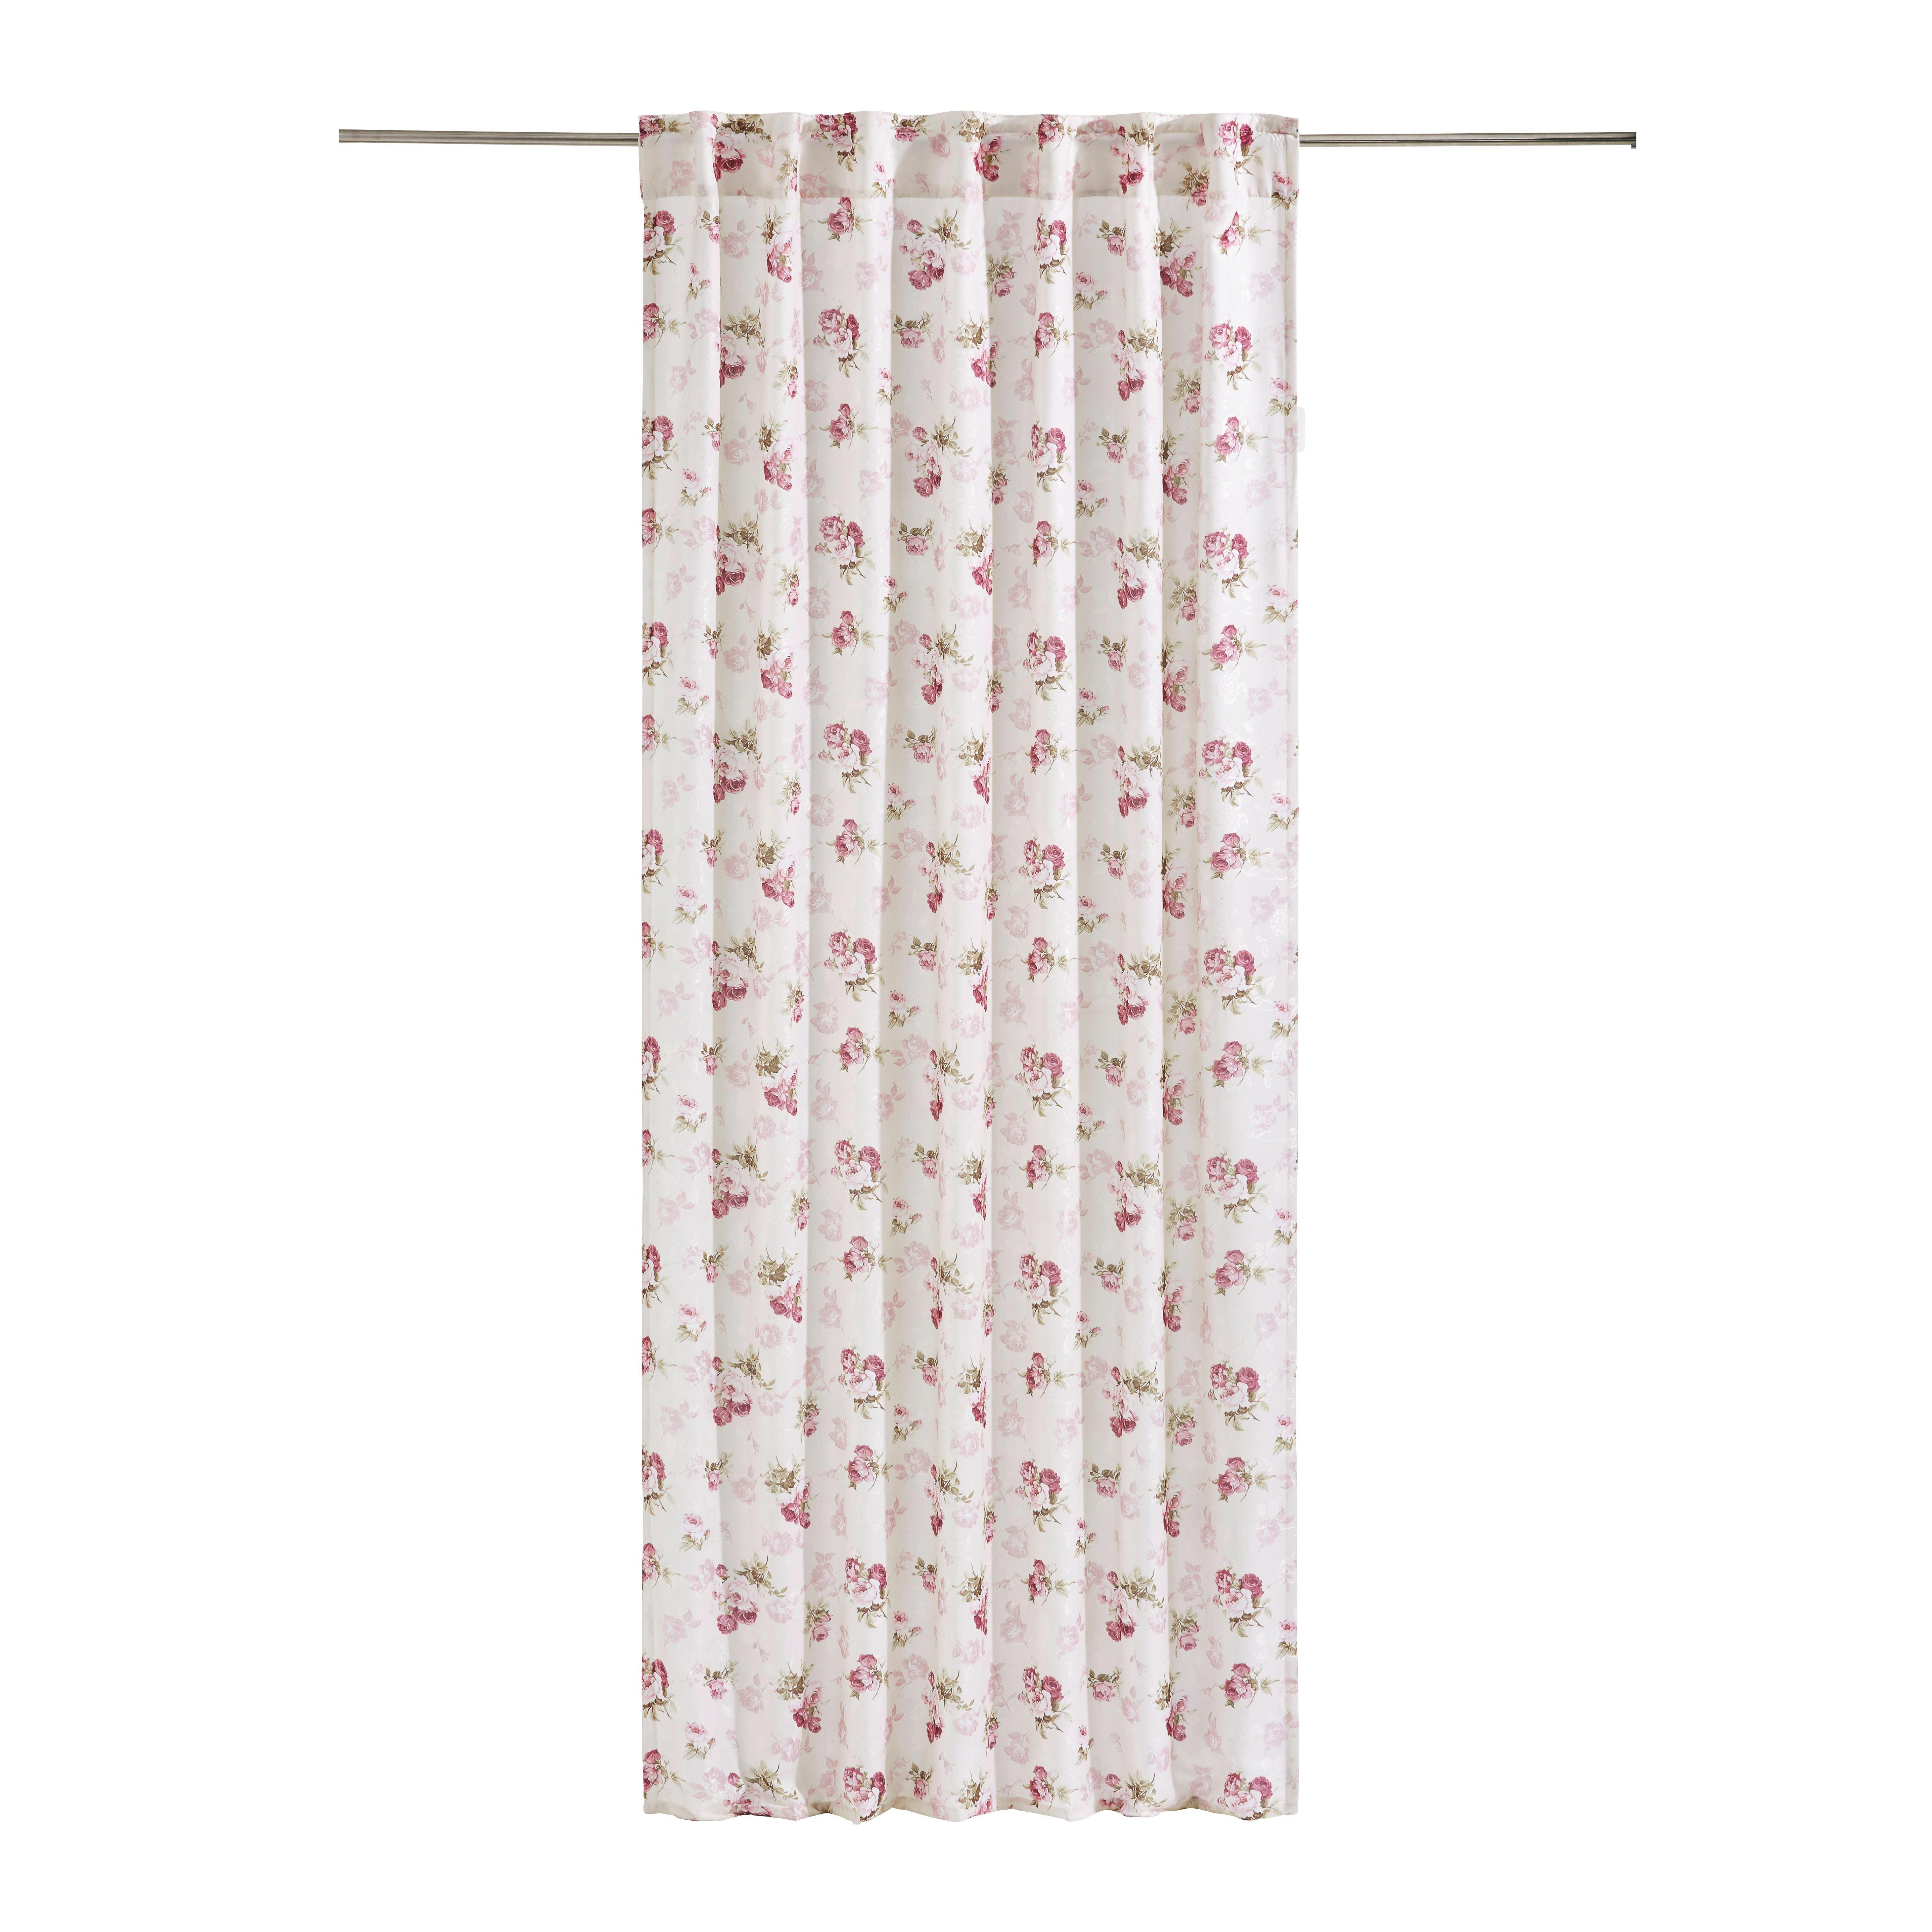 KOMBIVORHANG blickdicht - Rosa/Weiß, LIFESTYLE, Textil (135/245cm) - ESPOSA